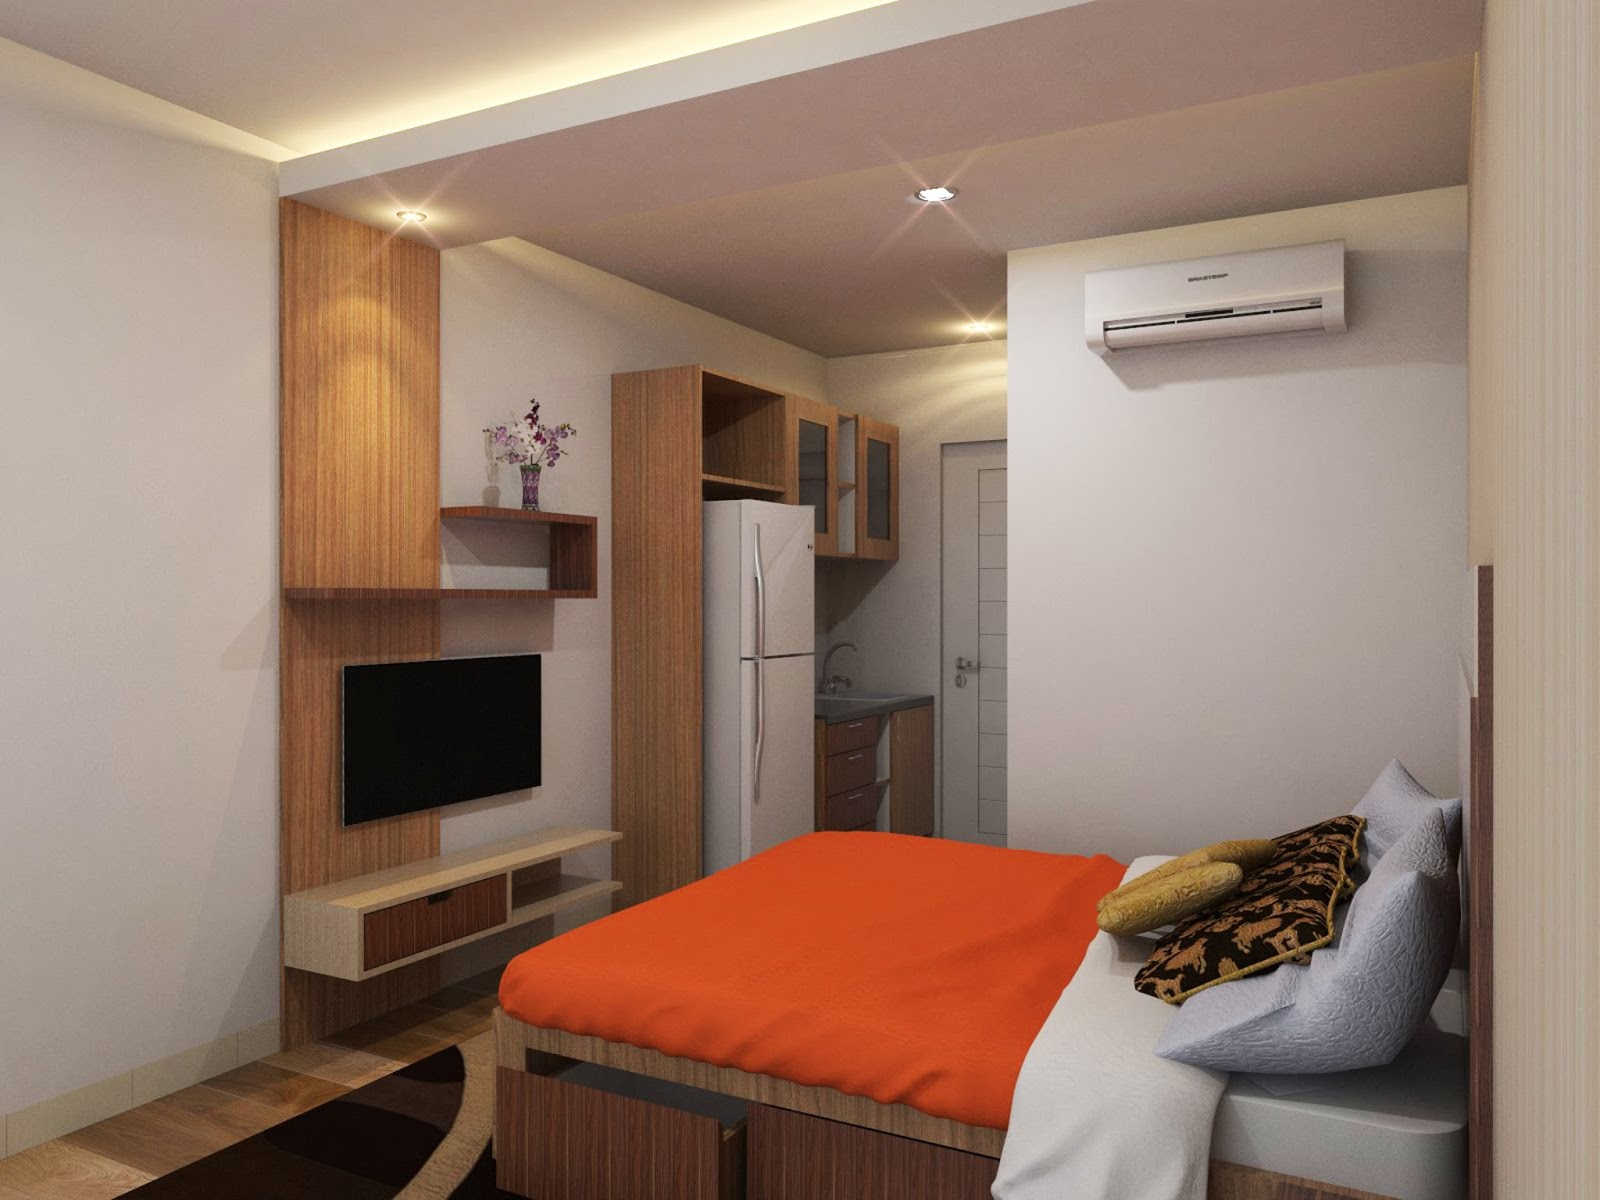 Desain Kamar Apartemen Tipe Studio